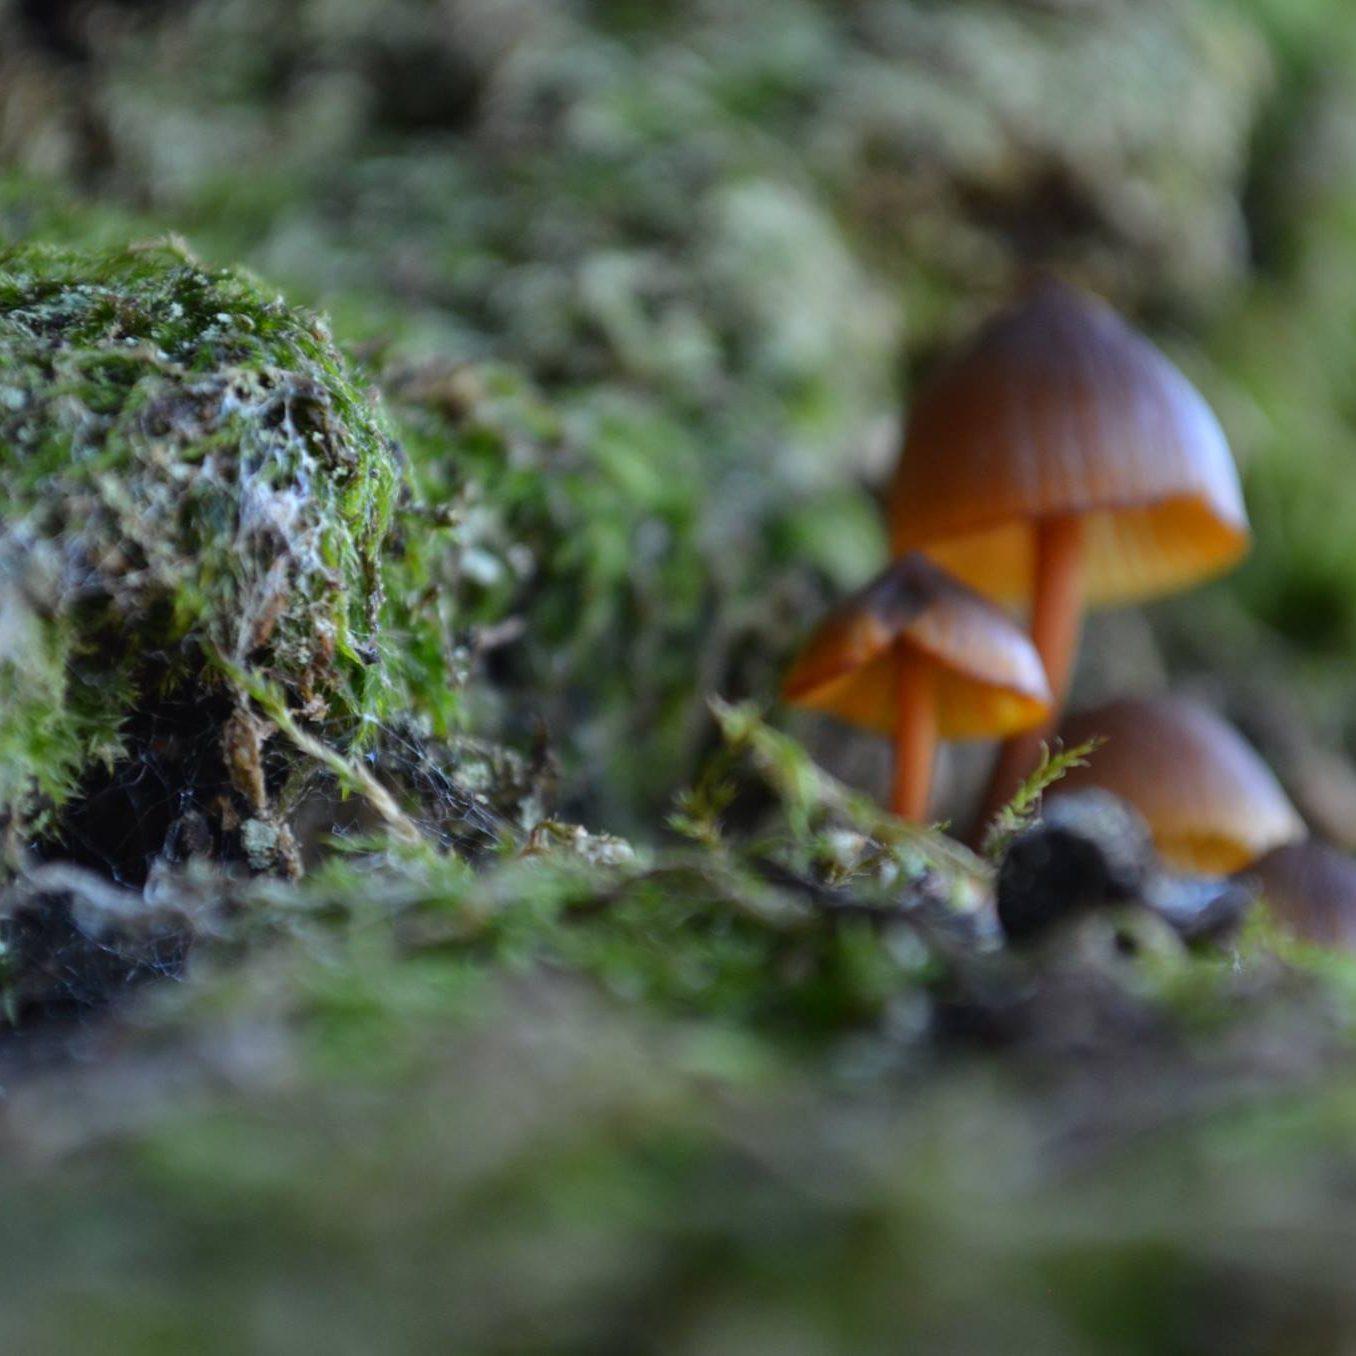 setas-en-extremadura-micologia-micoturismo